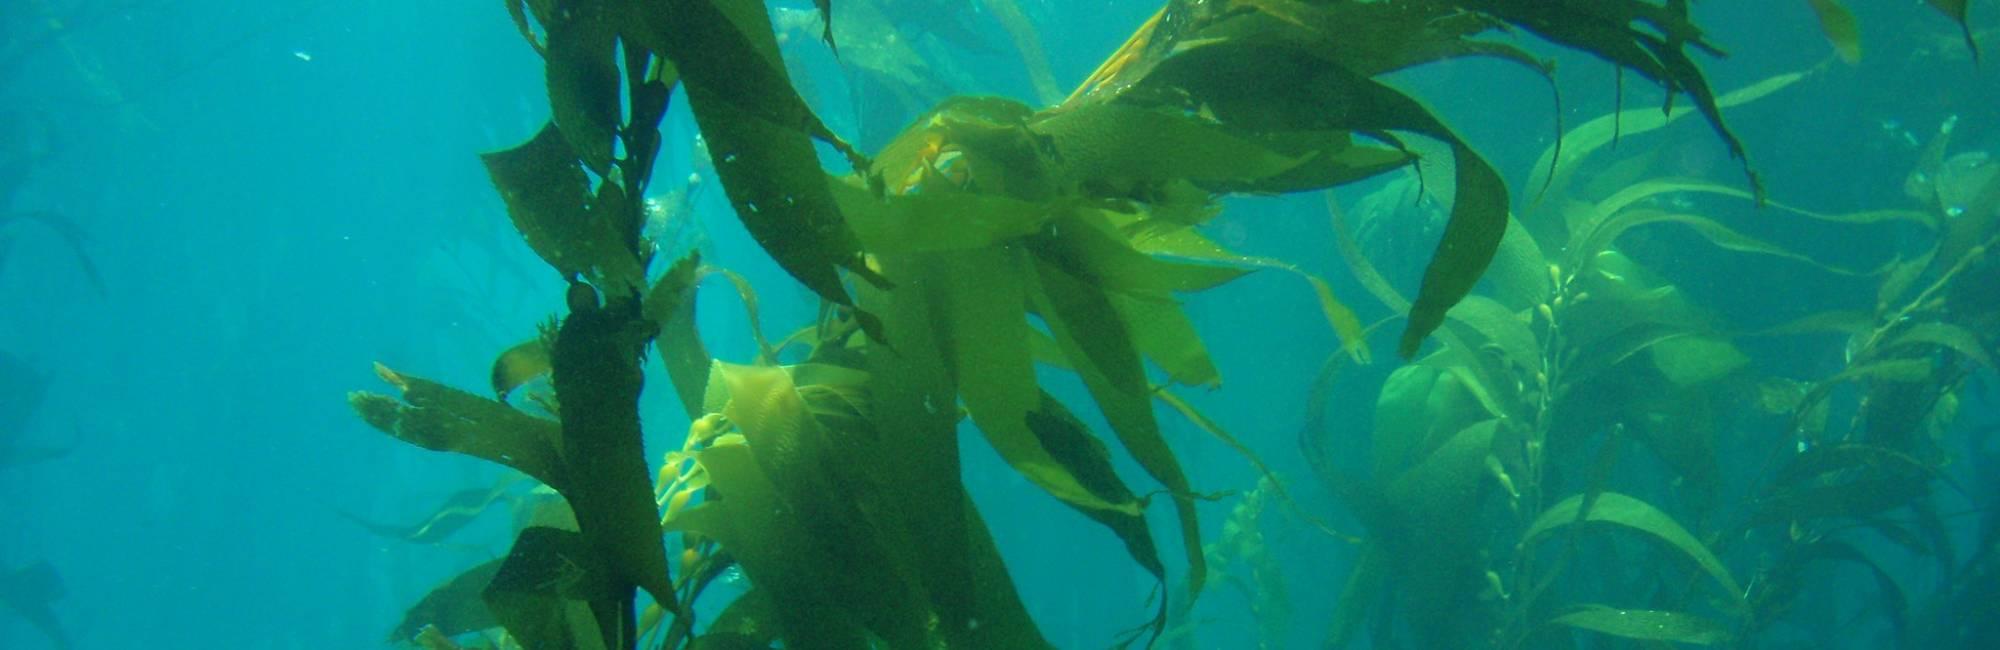 Green sea kelp in water